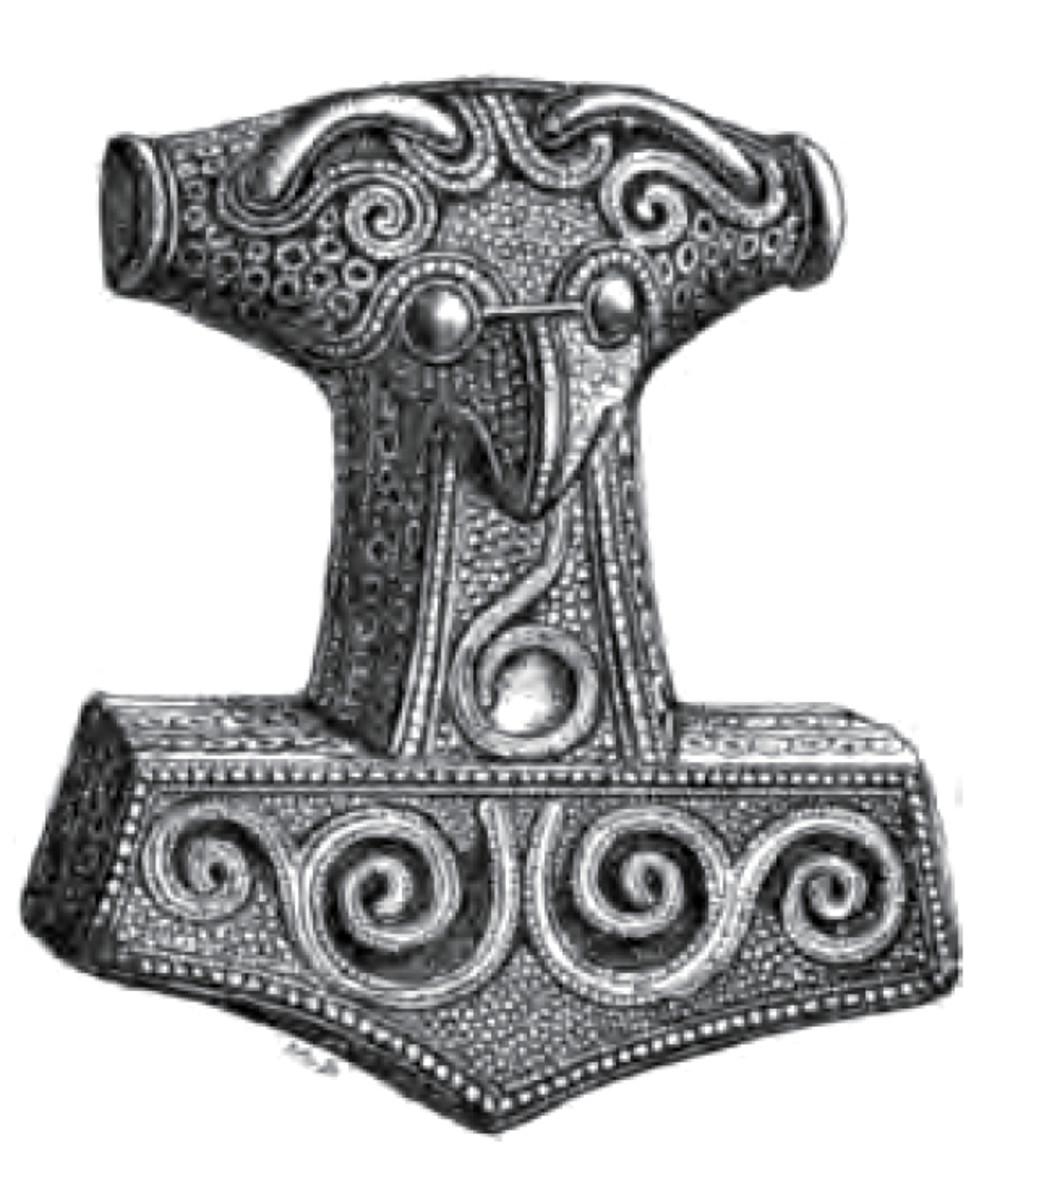 Thor's Hammer - Mjoellnir - from Skaane, present day south-western Sweden. formerly Danish territory